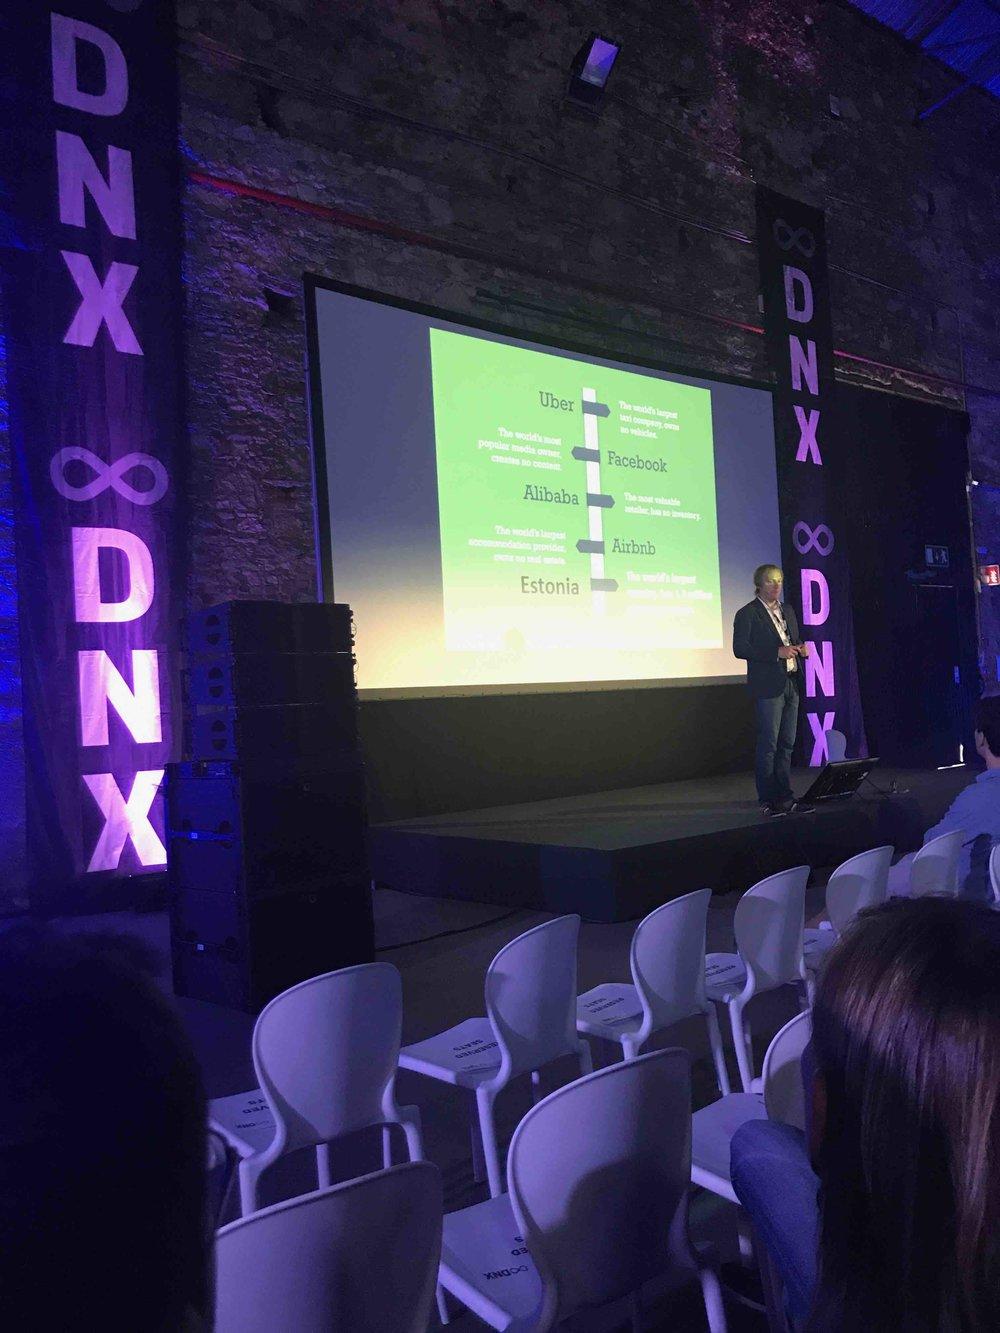 #lissabon #disawistories #lxfactory #digitalesleben #dnxlissabon 1.jpg